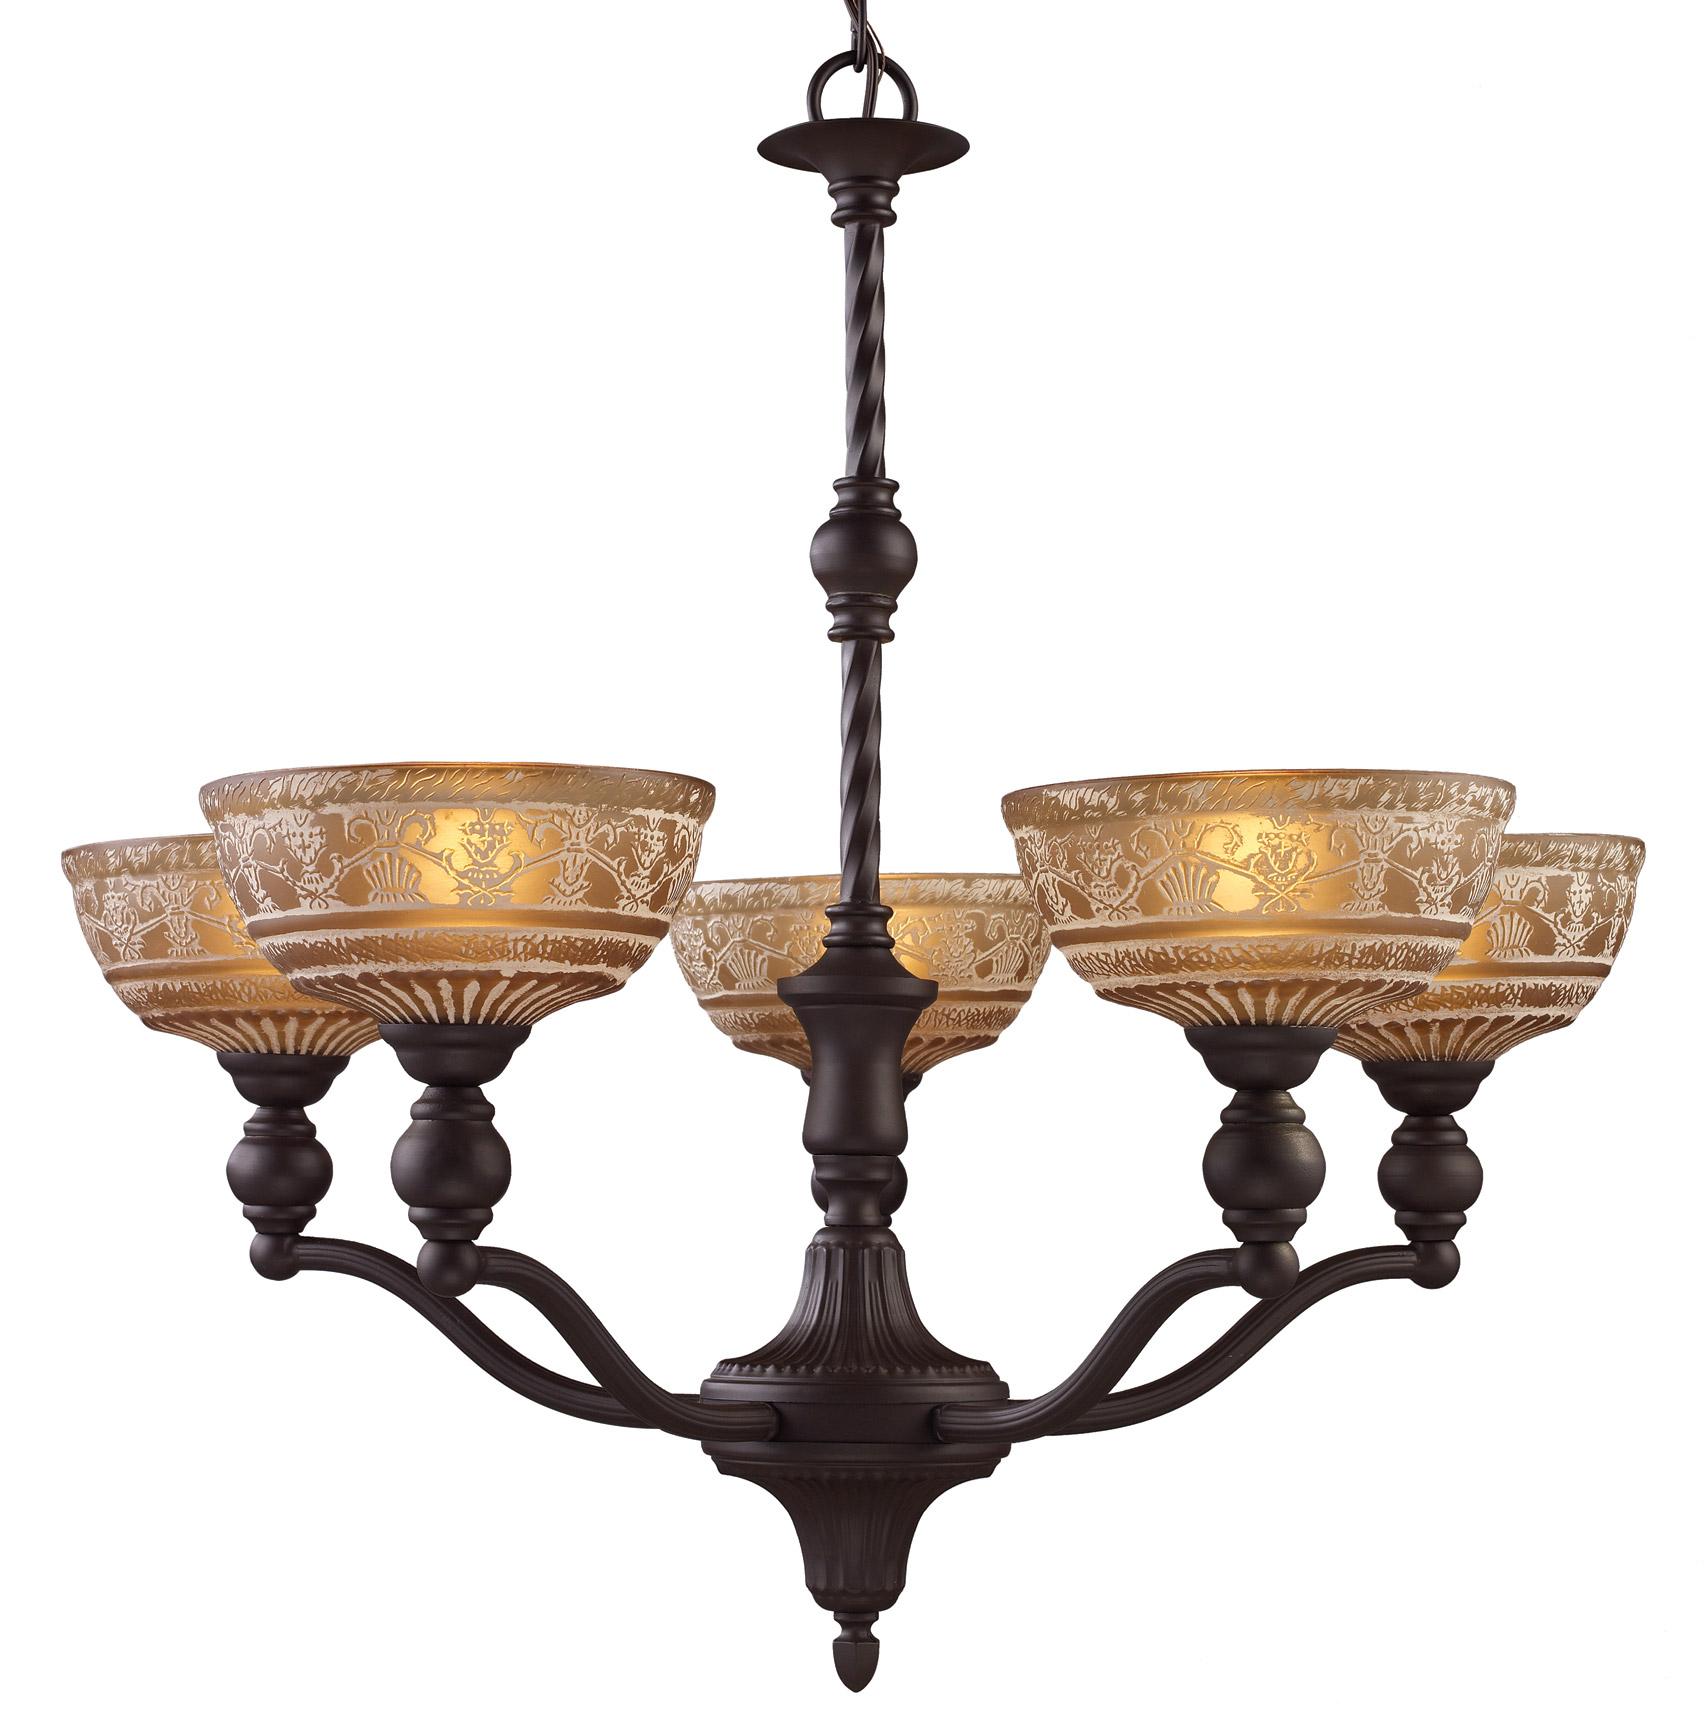 Elk lighting 66197 5 norwich five light chandelier aloadofball Images